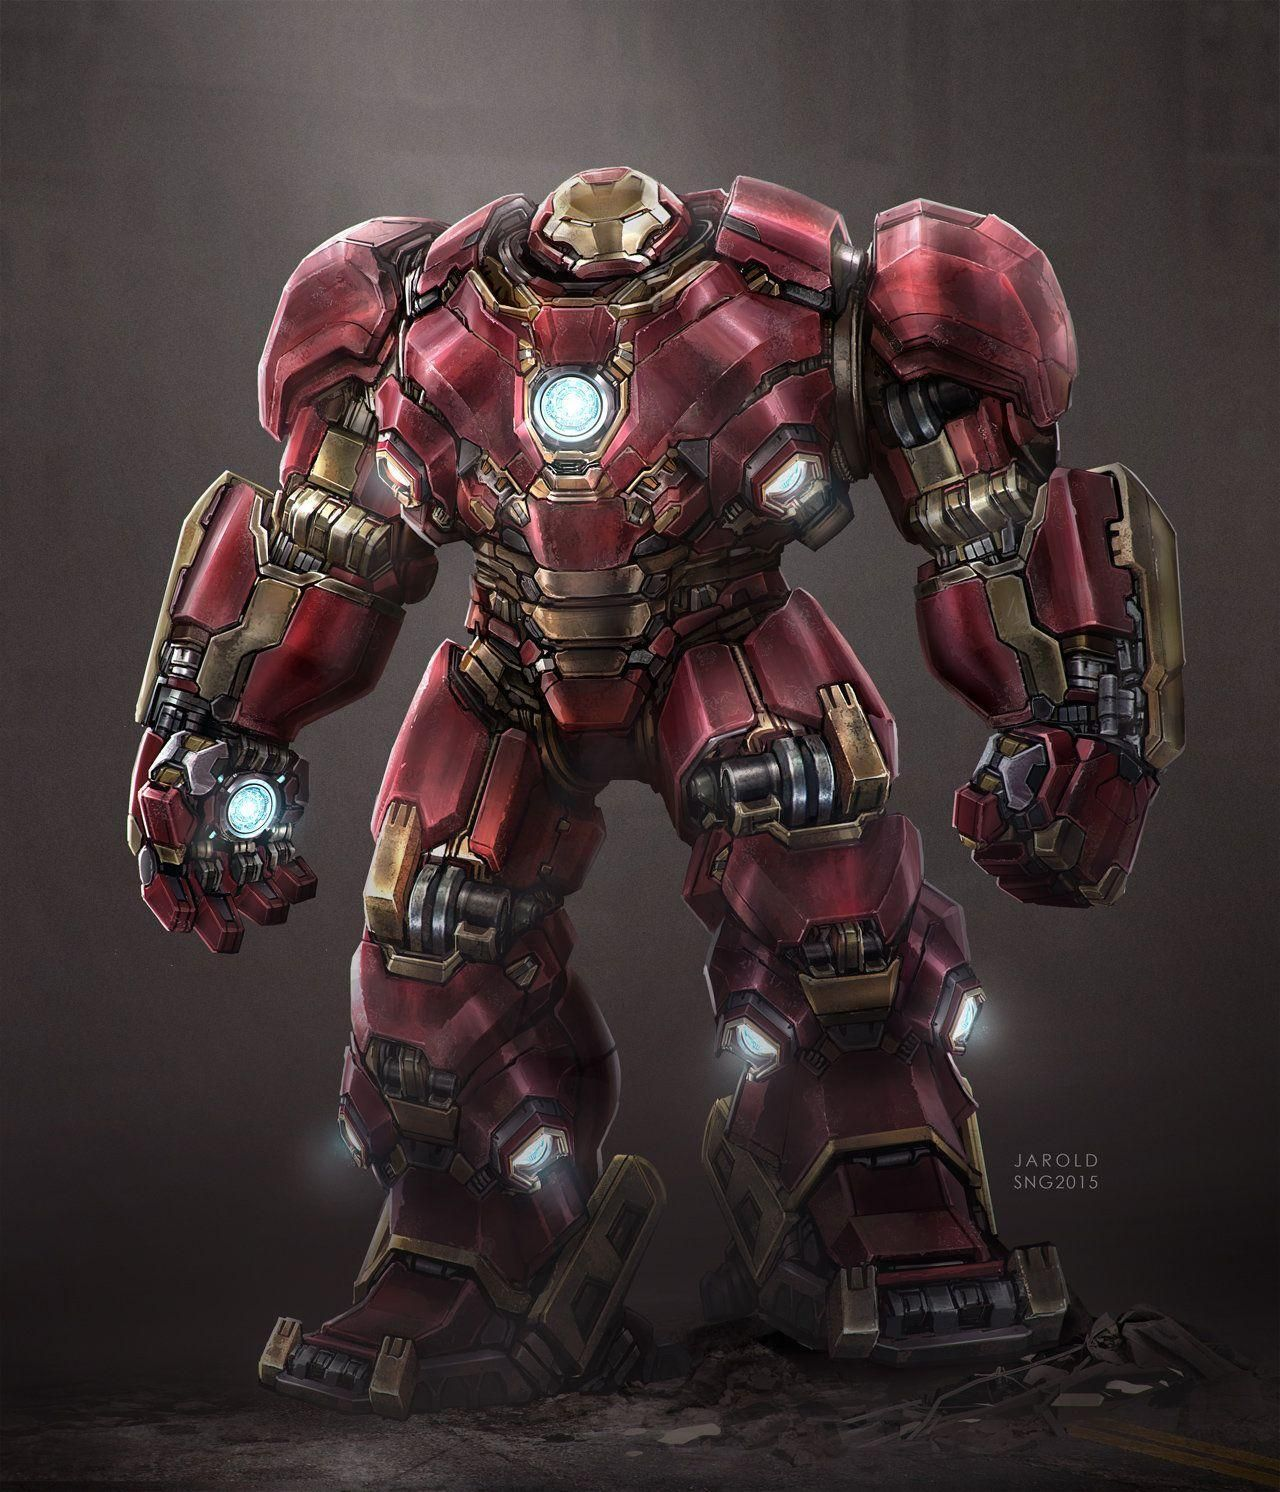 Resultado De Imagen Para Iron Man Hulkbuster Wallpaper Iron Man Hulkbuster Iron Man Armor Iron Man